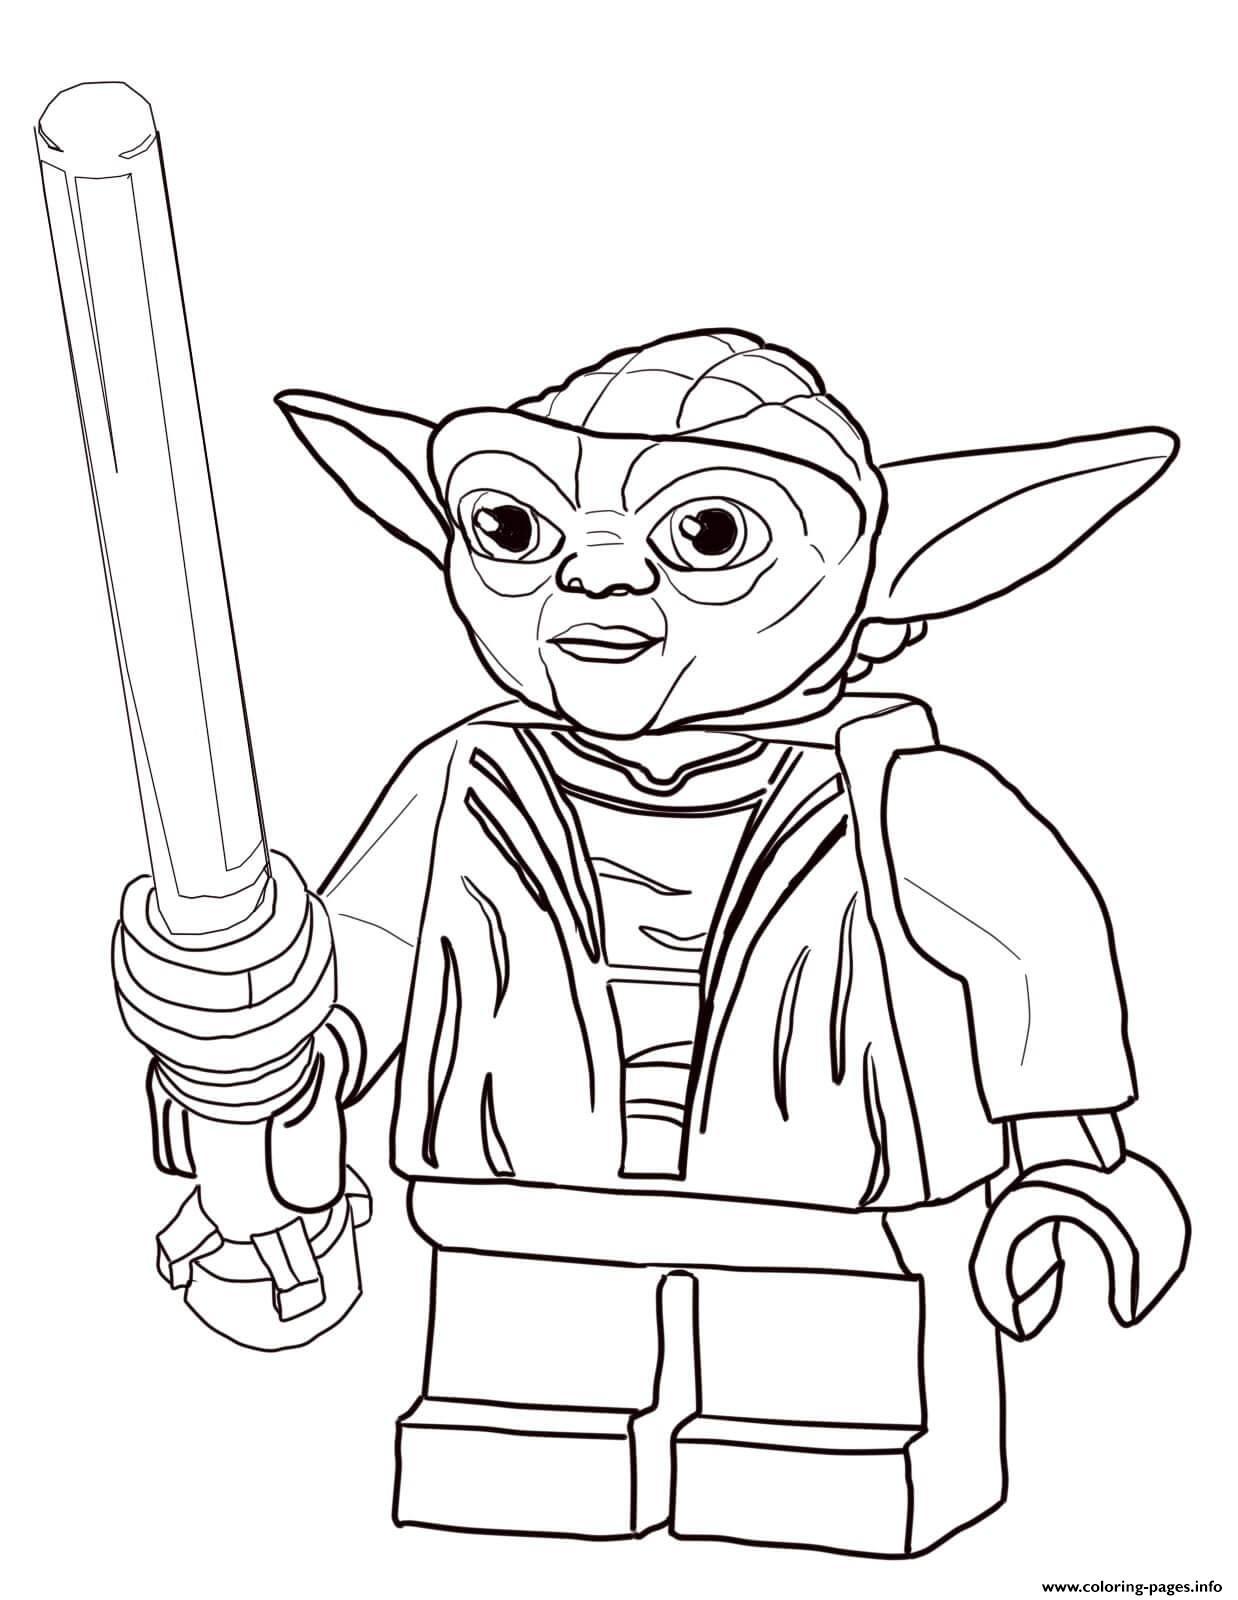 - Lego Star Wars Master Yoda Coloring Pages Printable